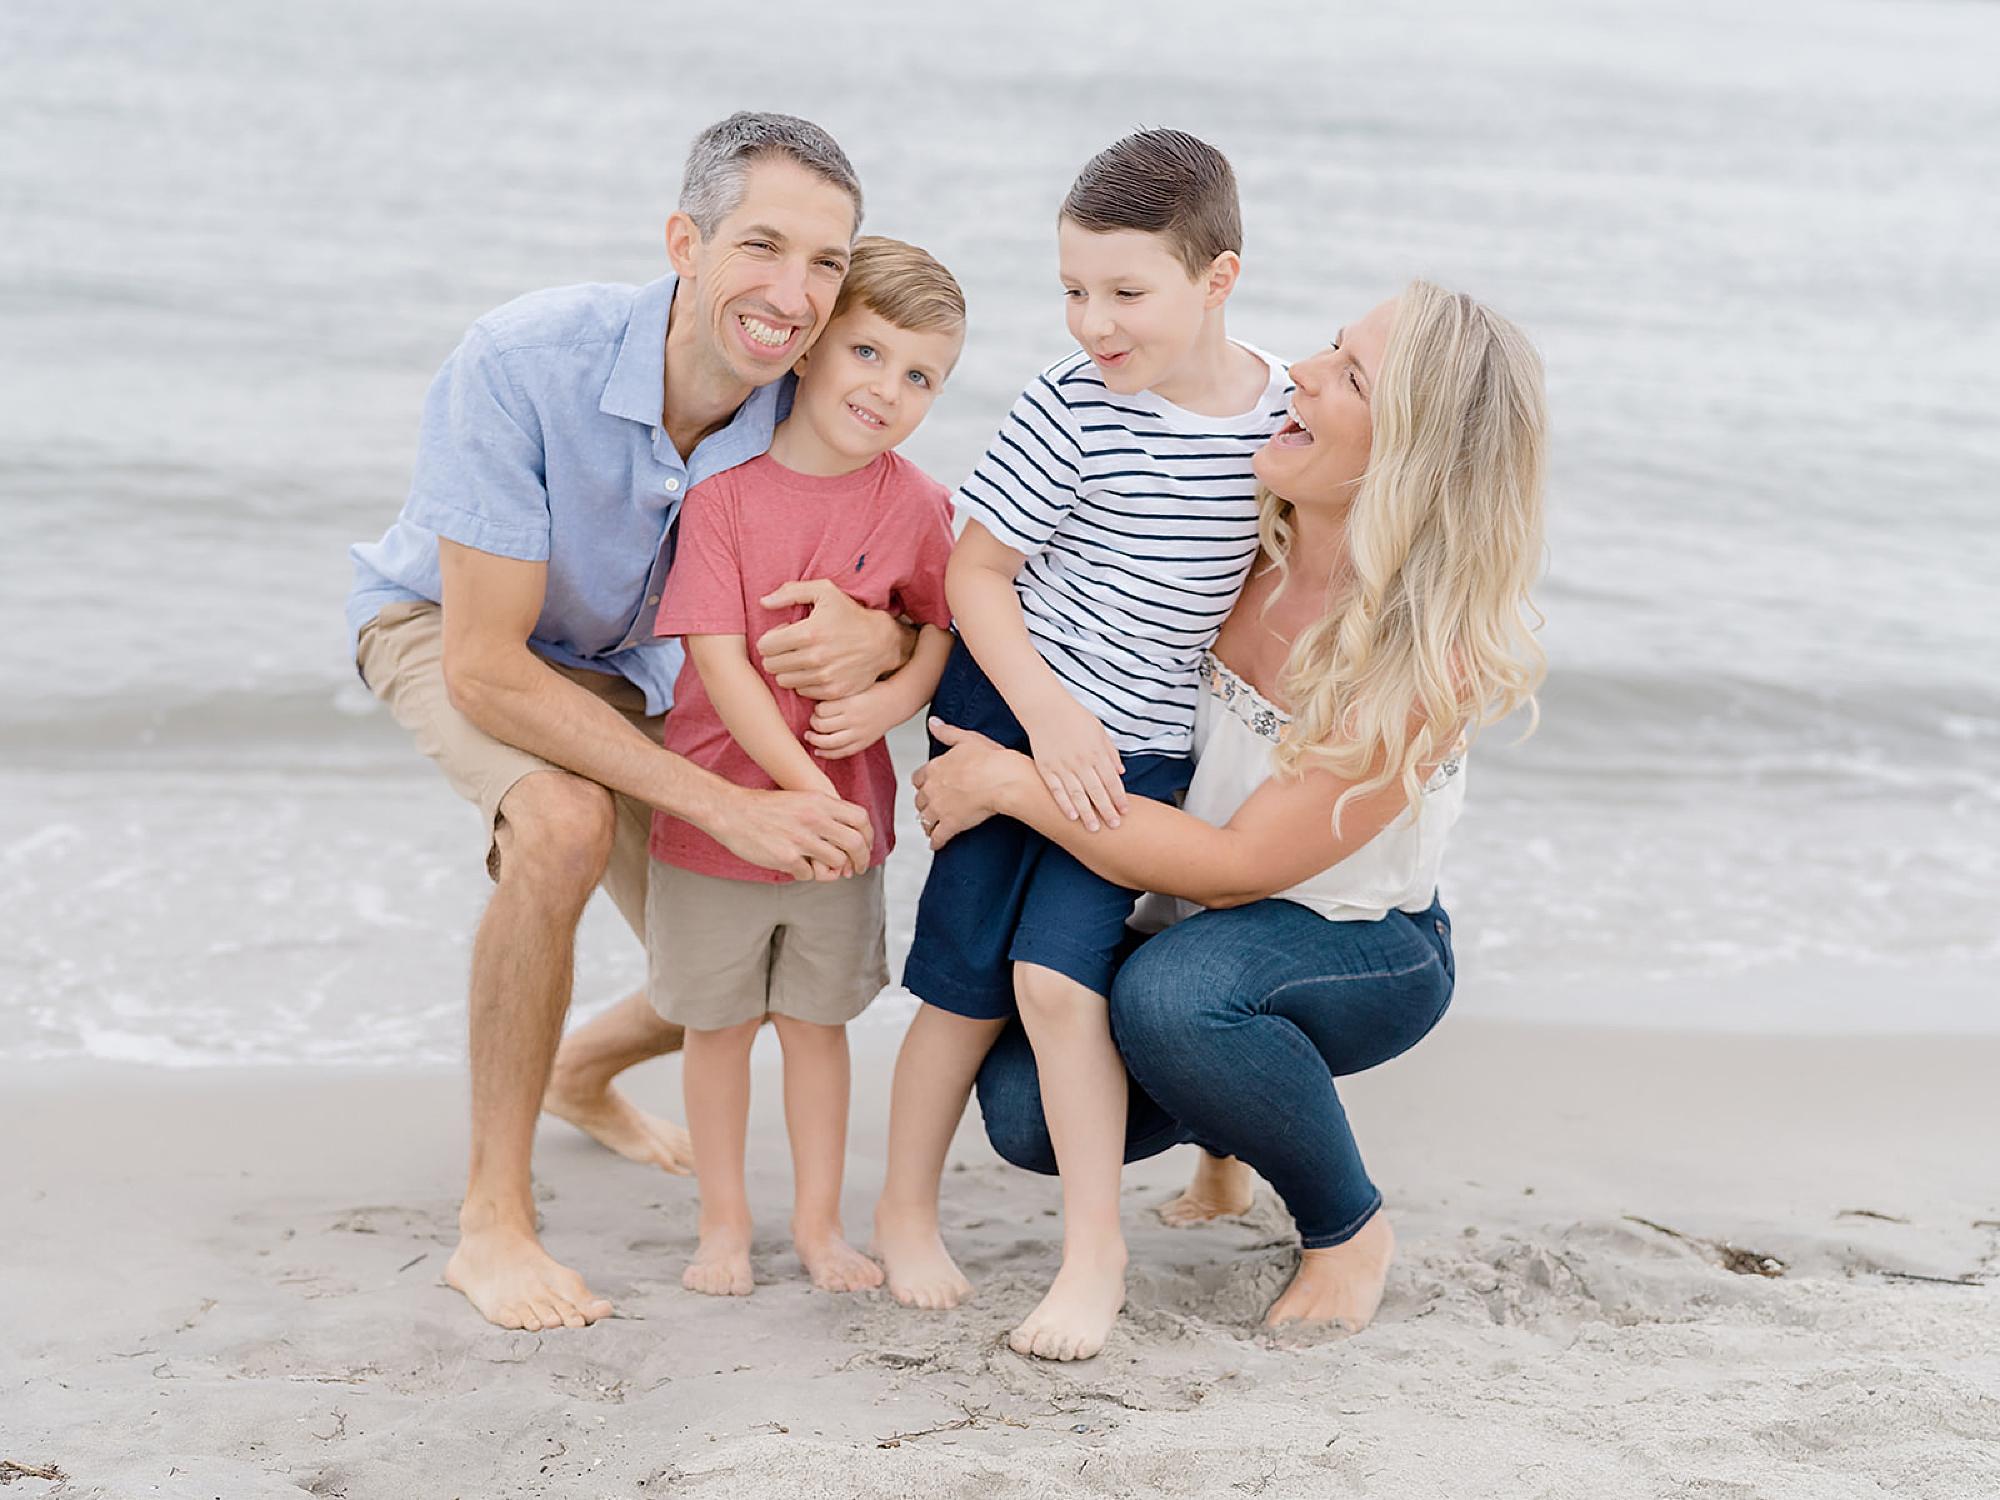 Ocean City Family Photography by Magdalena Studios 0004